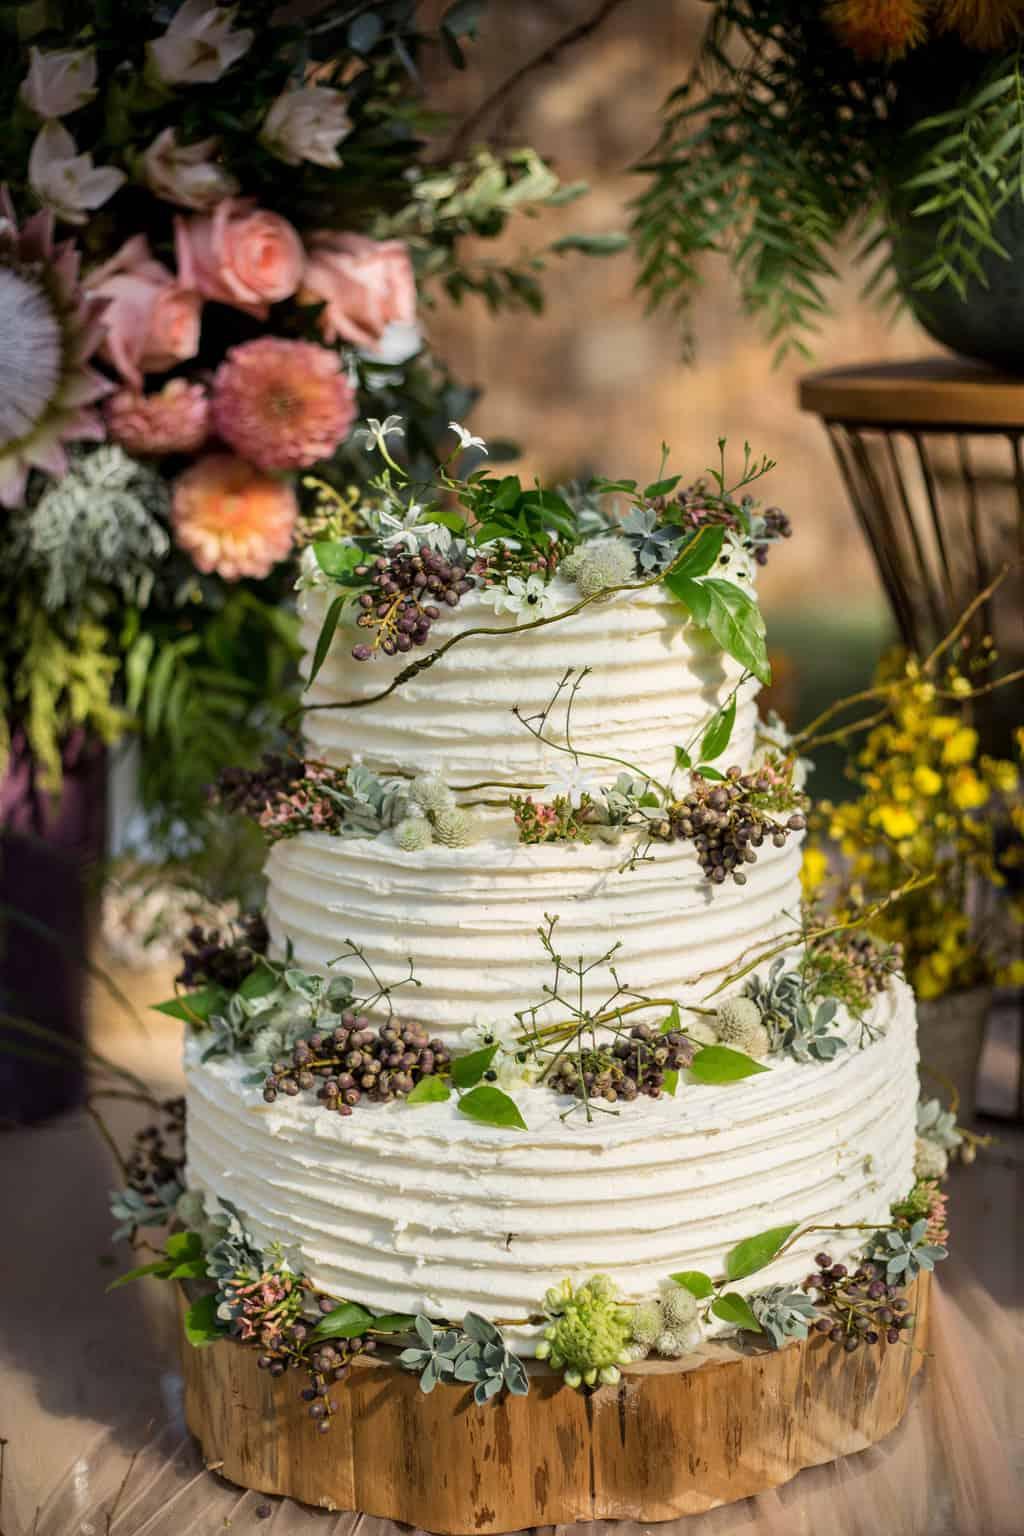 make-a-cake